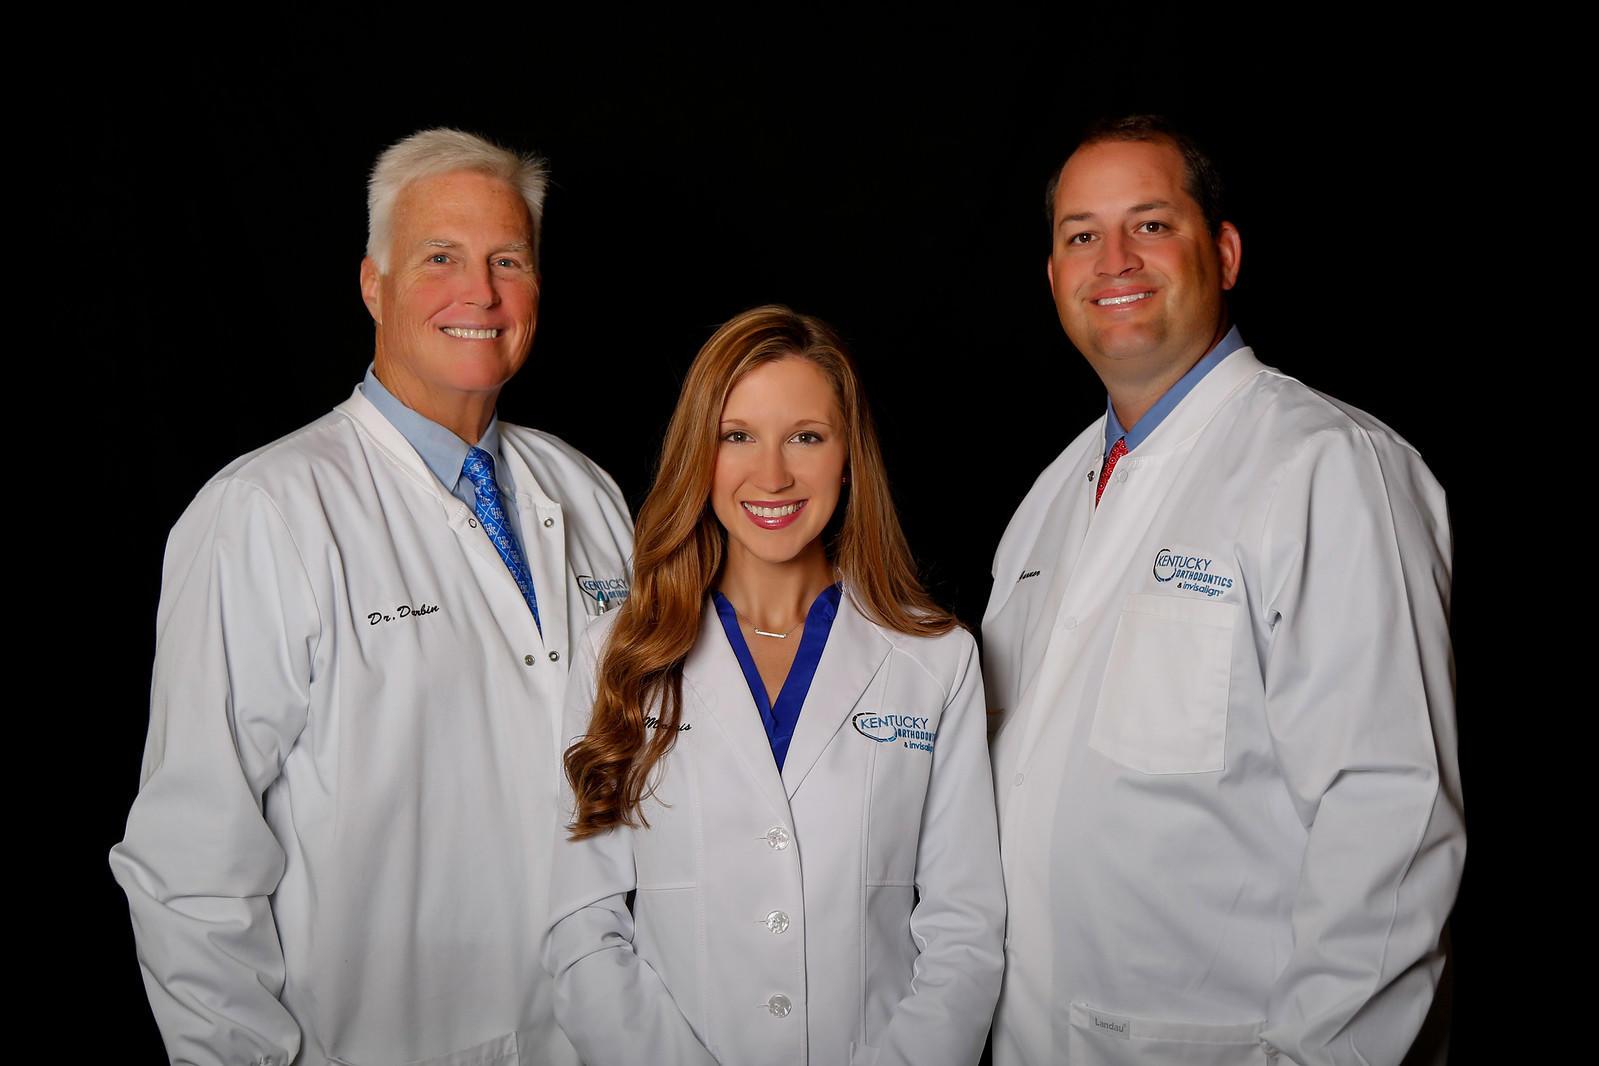 Kentucky Orthodontics & Invisalign